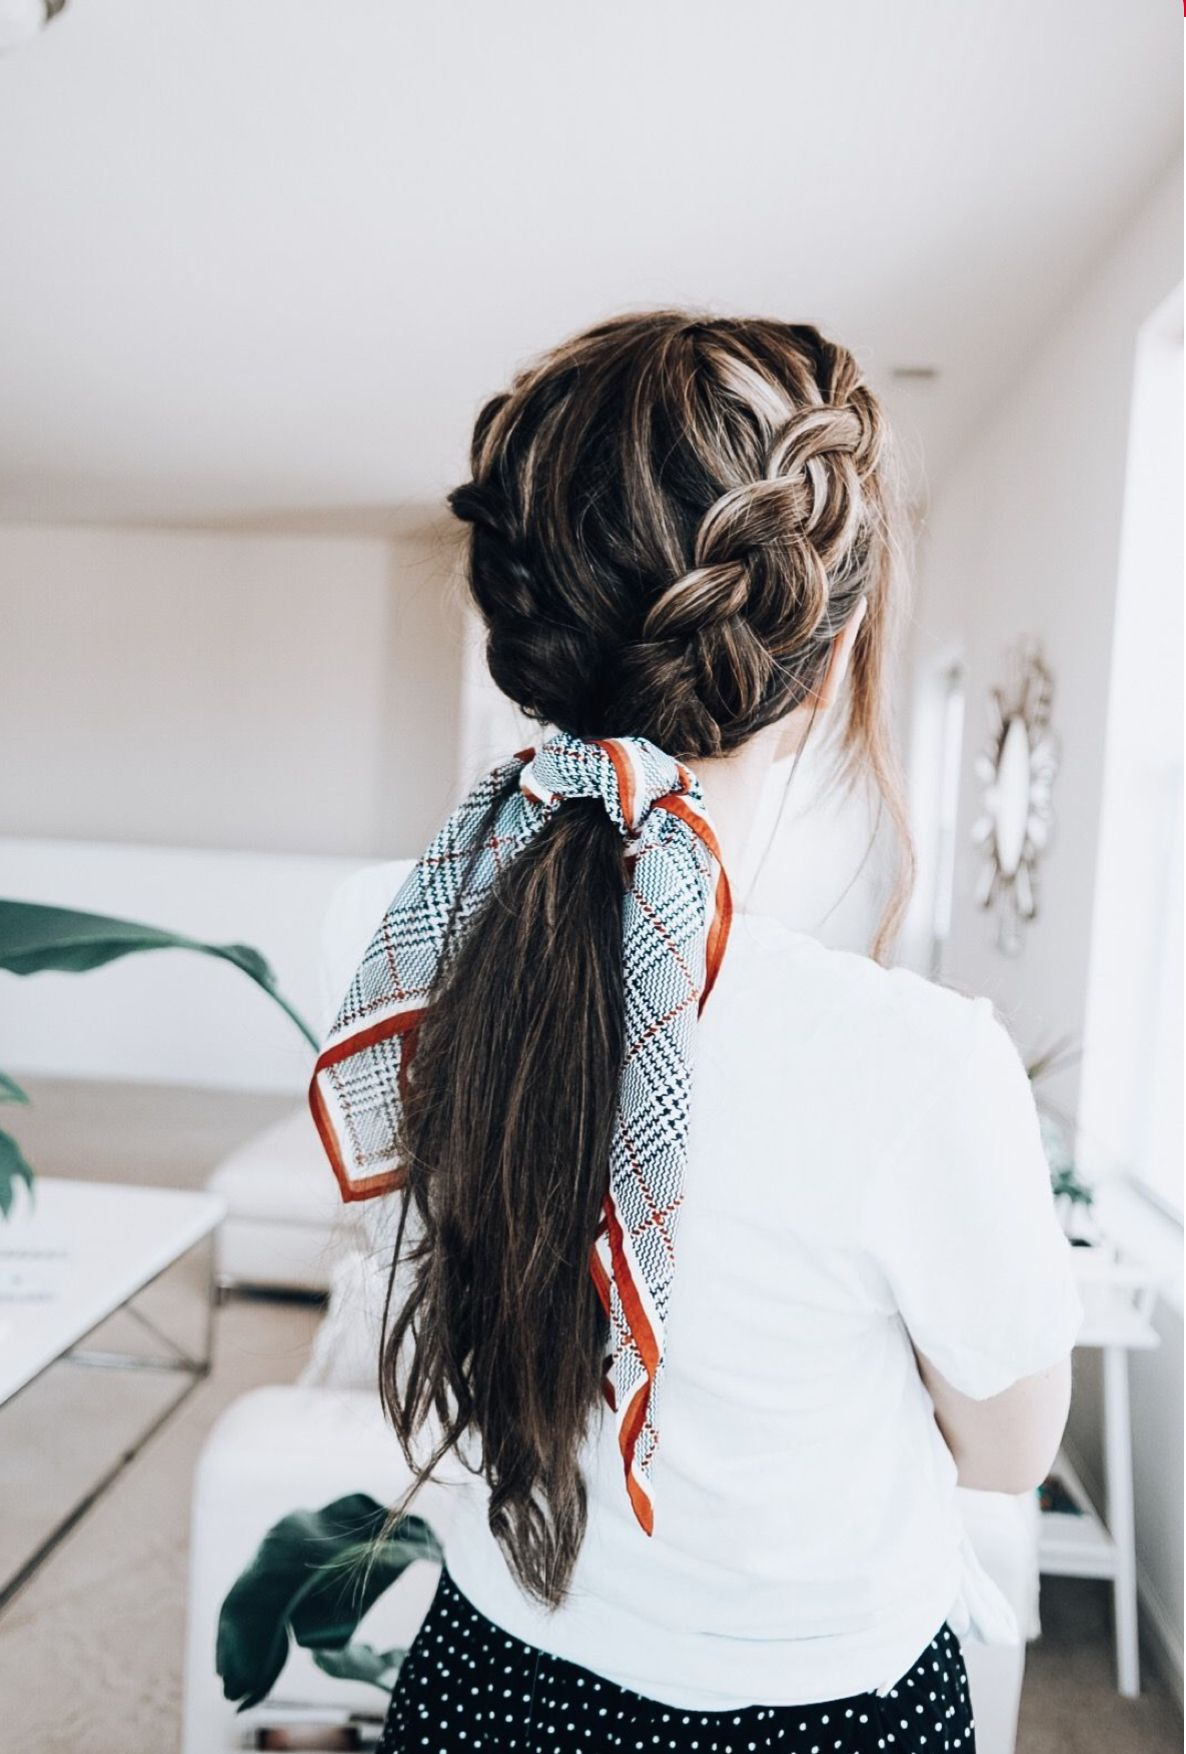 Hair Hairstyles Scarf Hairstyles Hair Lengths Long Hair Styles